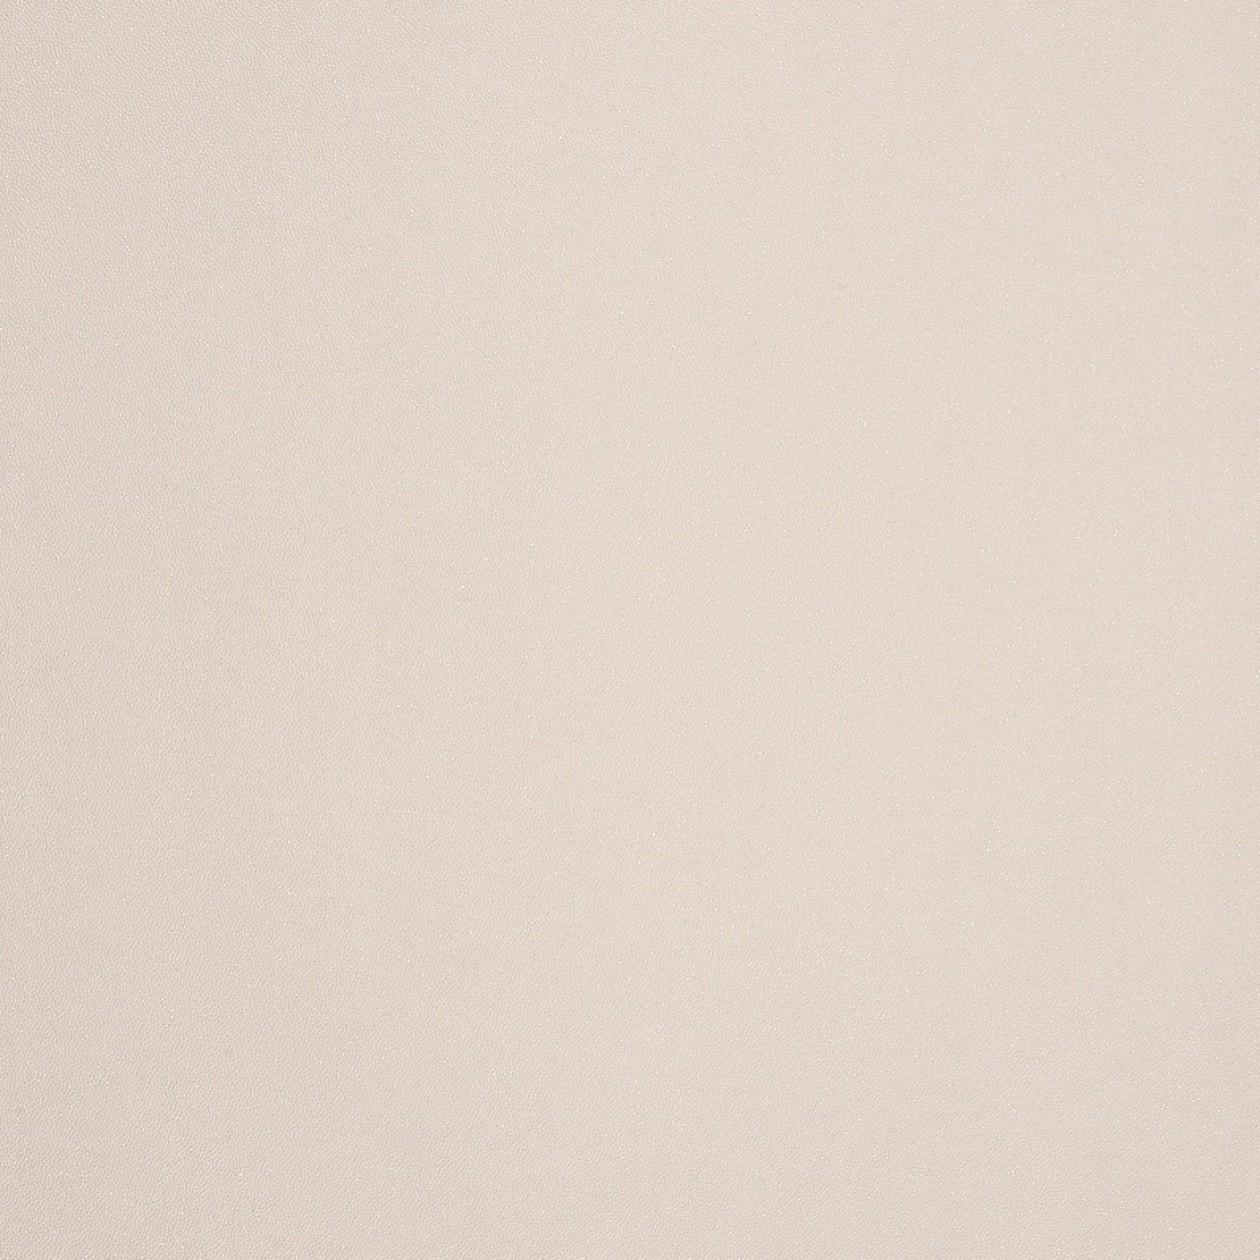 Французские обои Caselio,  коллекция Elegante, артикулELG60531146